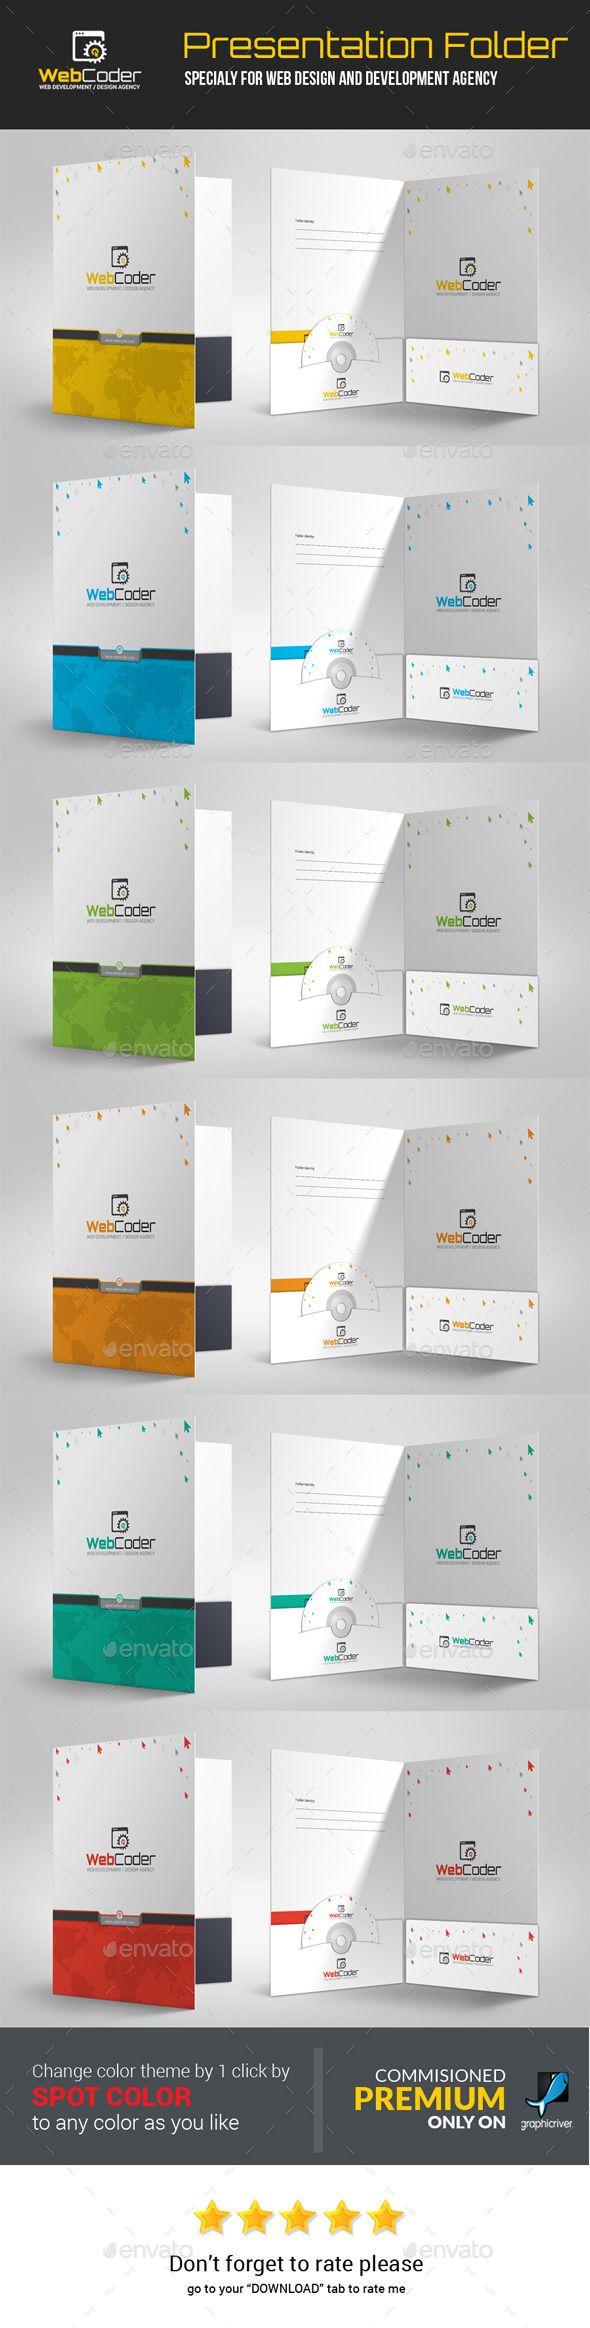 Web Coder   Web Design Agency Presentation Folder